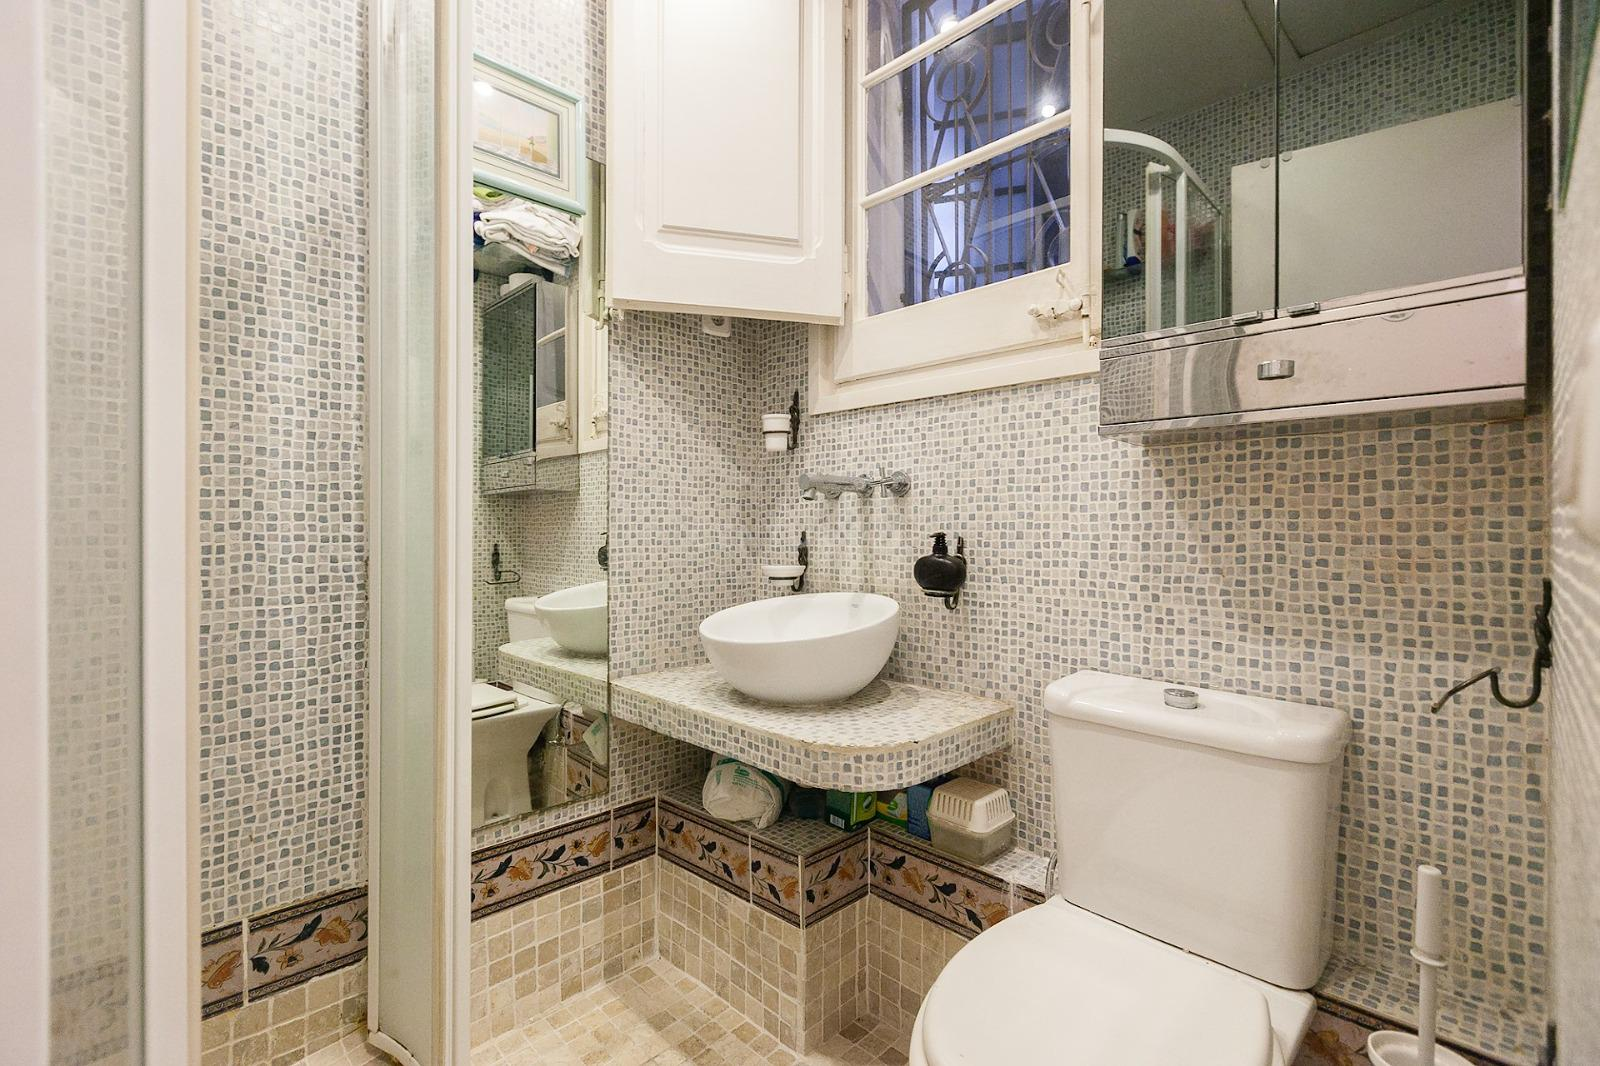 247916 Flat for sale in Sarrià-Sant Gervasi, Sant Gervasi-Galvany 21